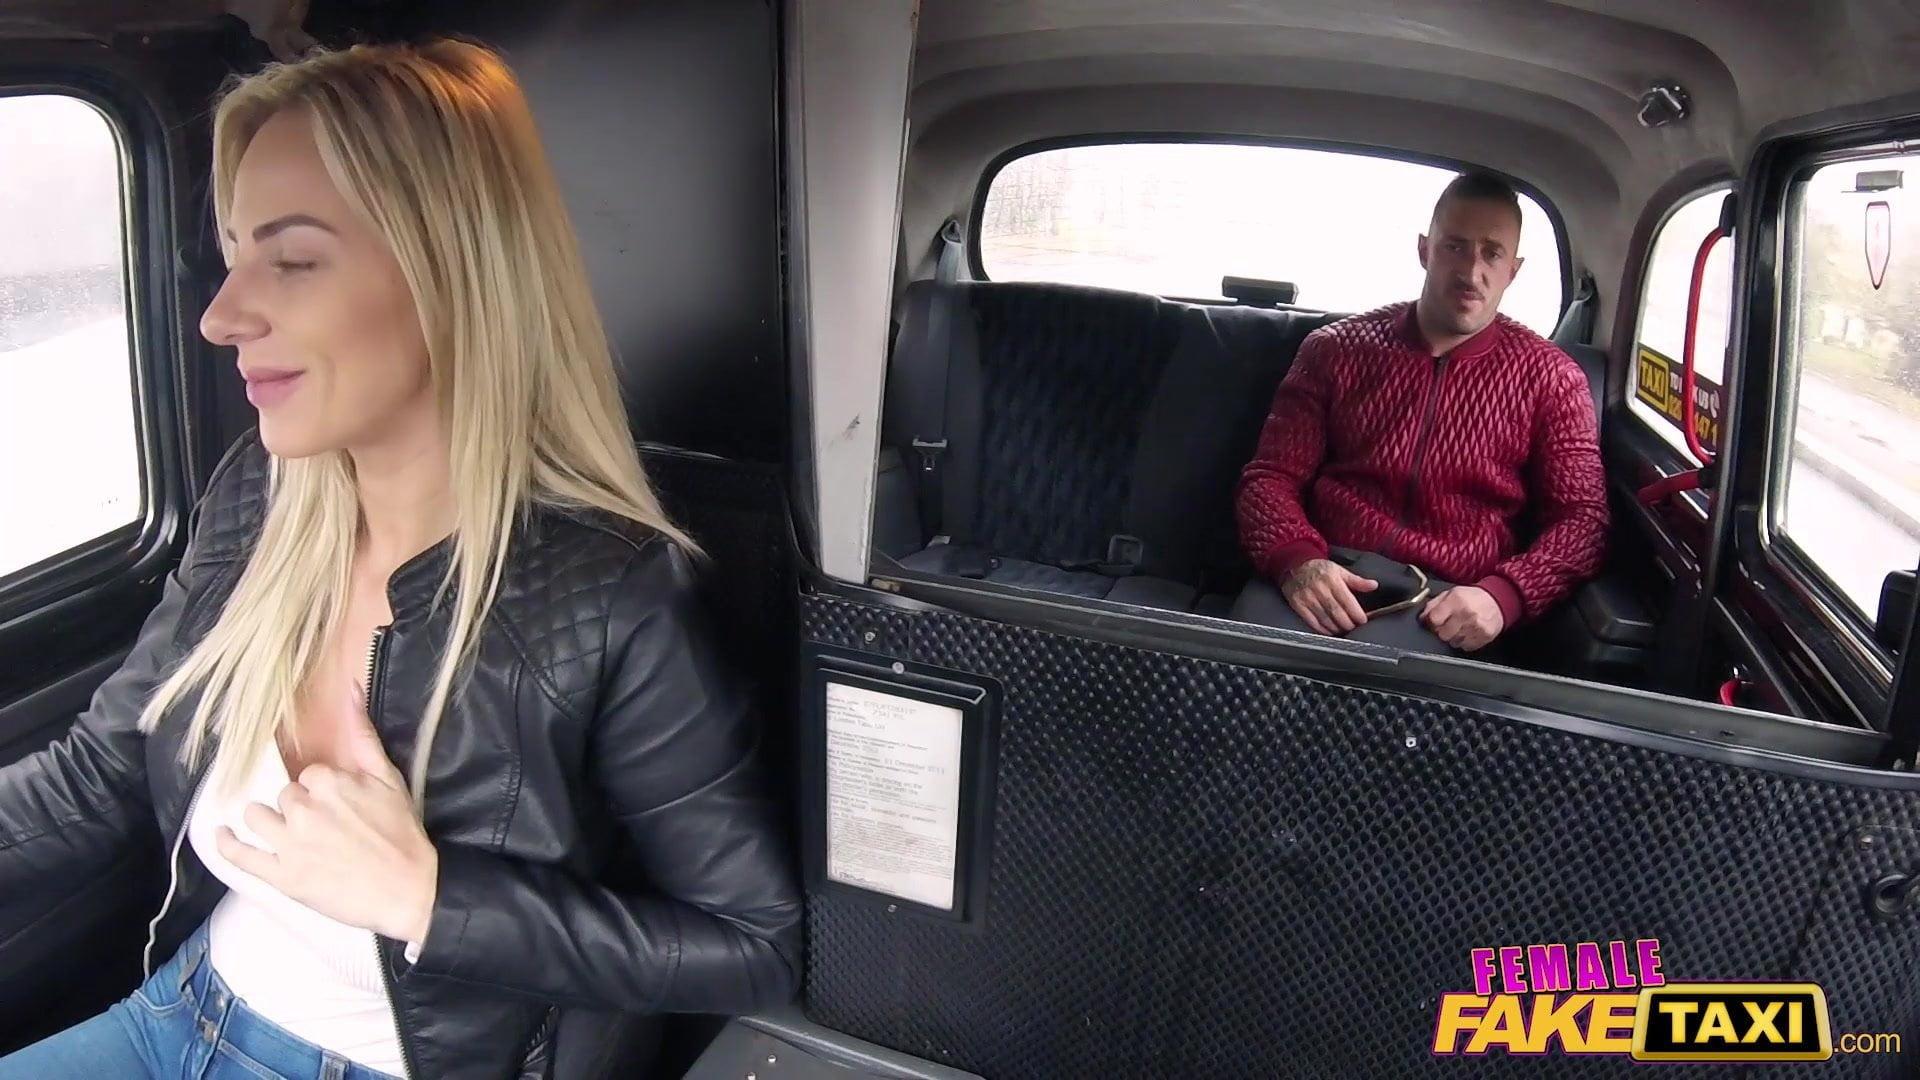 Female Fake Taxi Red Head